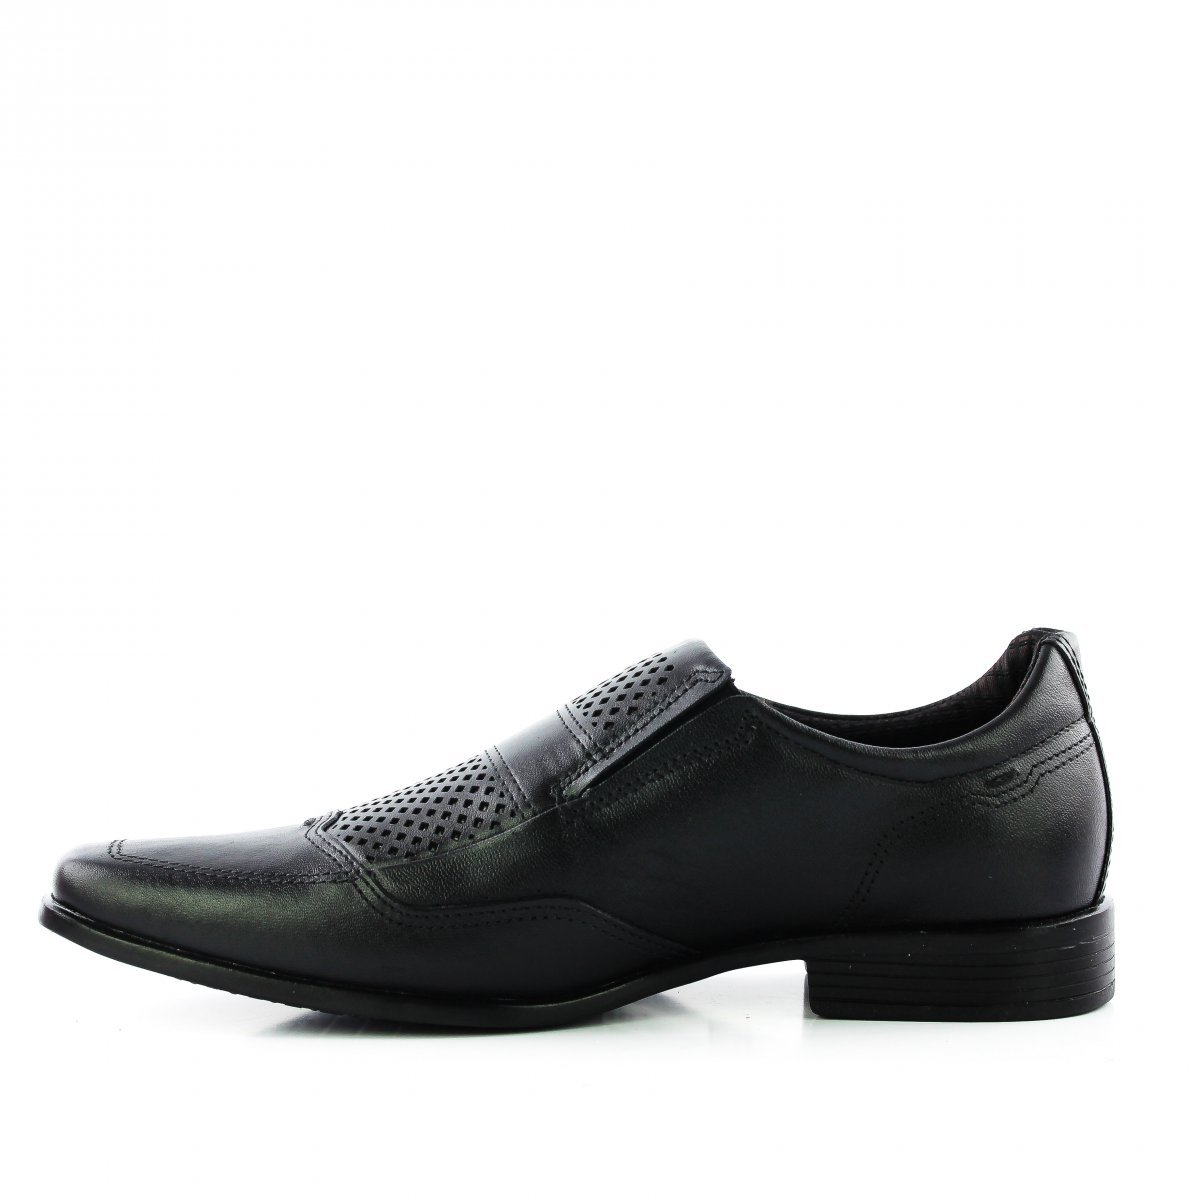 Sapato Preto Pegada Preto Sapato Sapato Sapato Pegada Pegada Preto xTYOXqXwHU